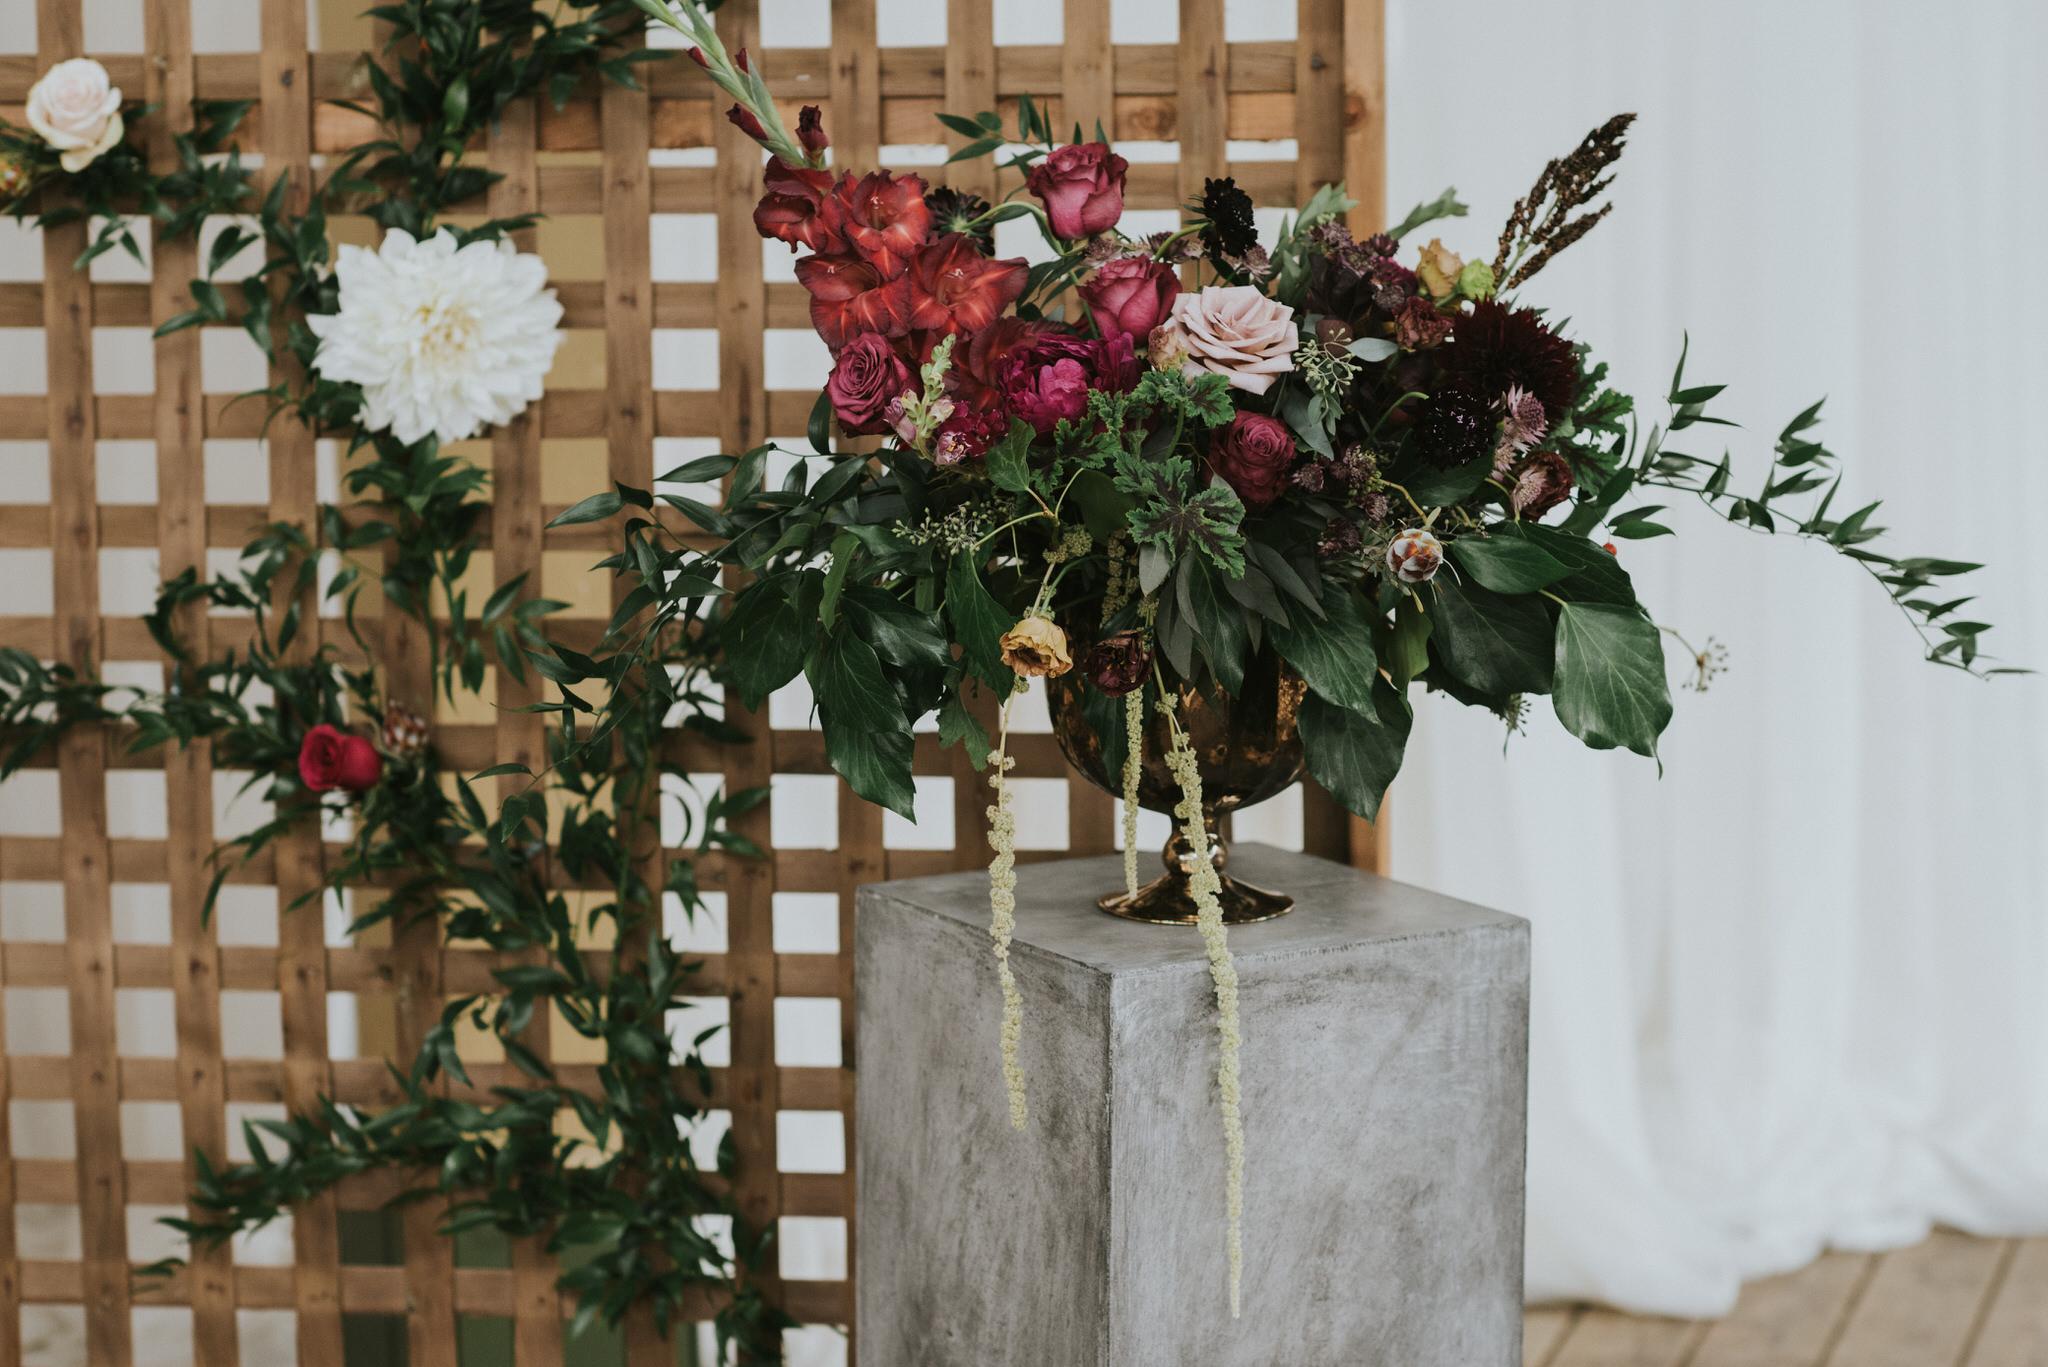 scarletoneillphotography_weddingphotography_prince edward county weddings076.JPG